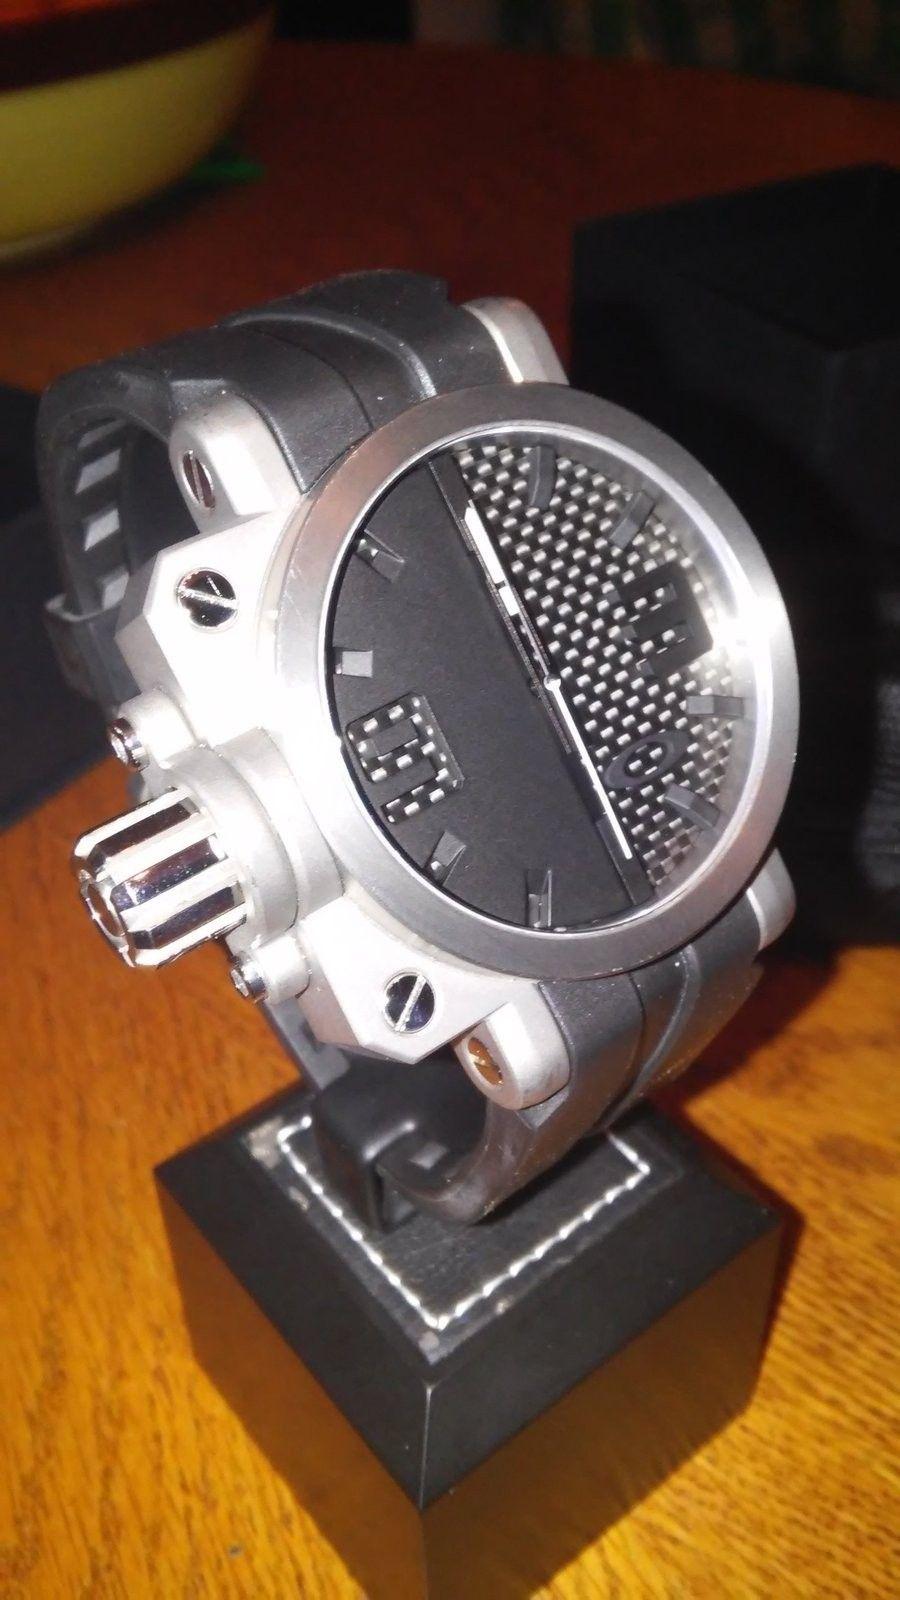 Gearbox ti/carbon fiber - 20150406_091633.jpg